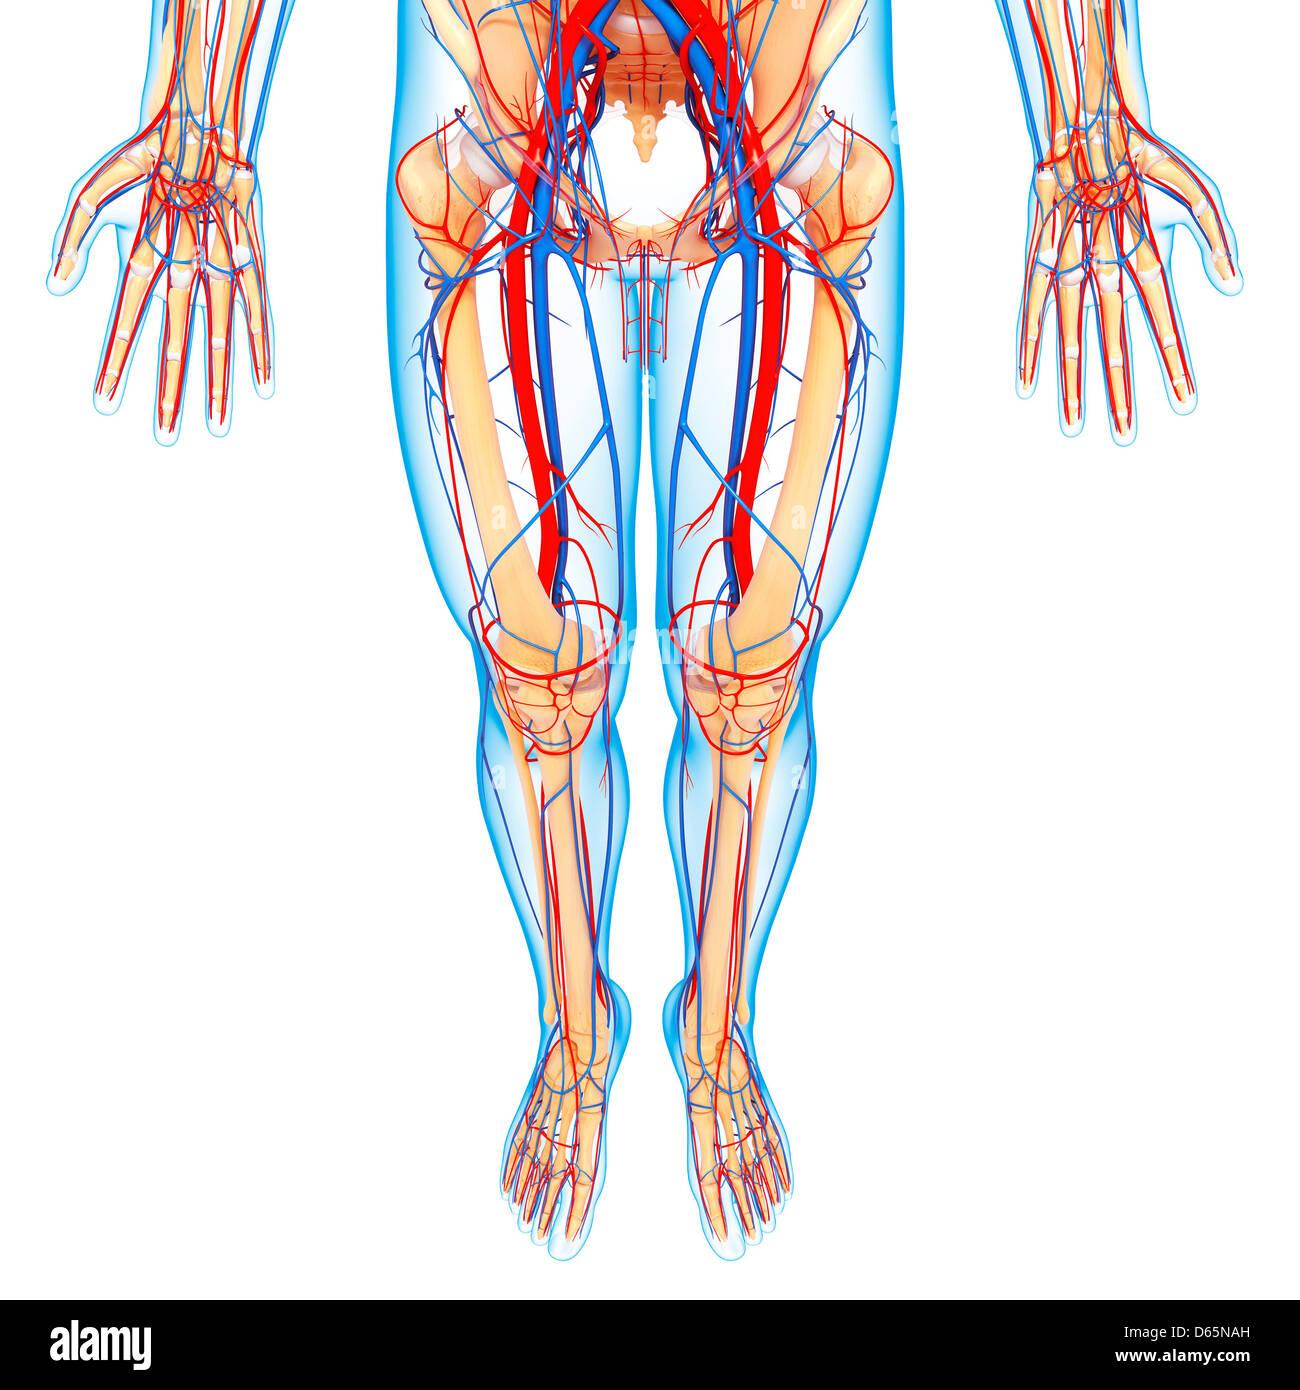 Vascular System Of The Legs Imágenes De Stock & Vascular System Of ...